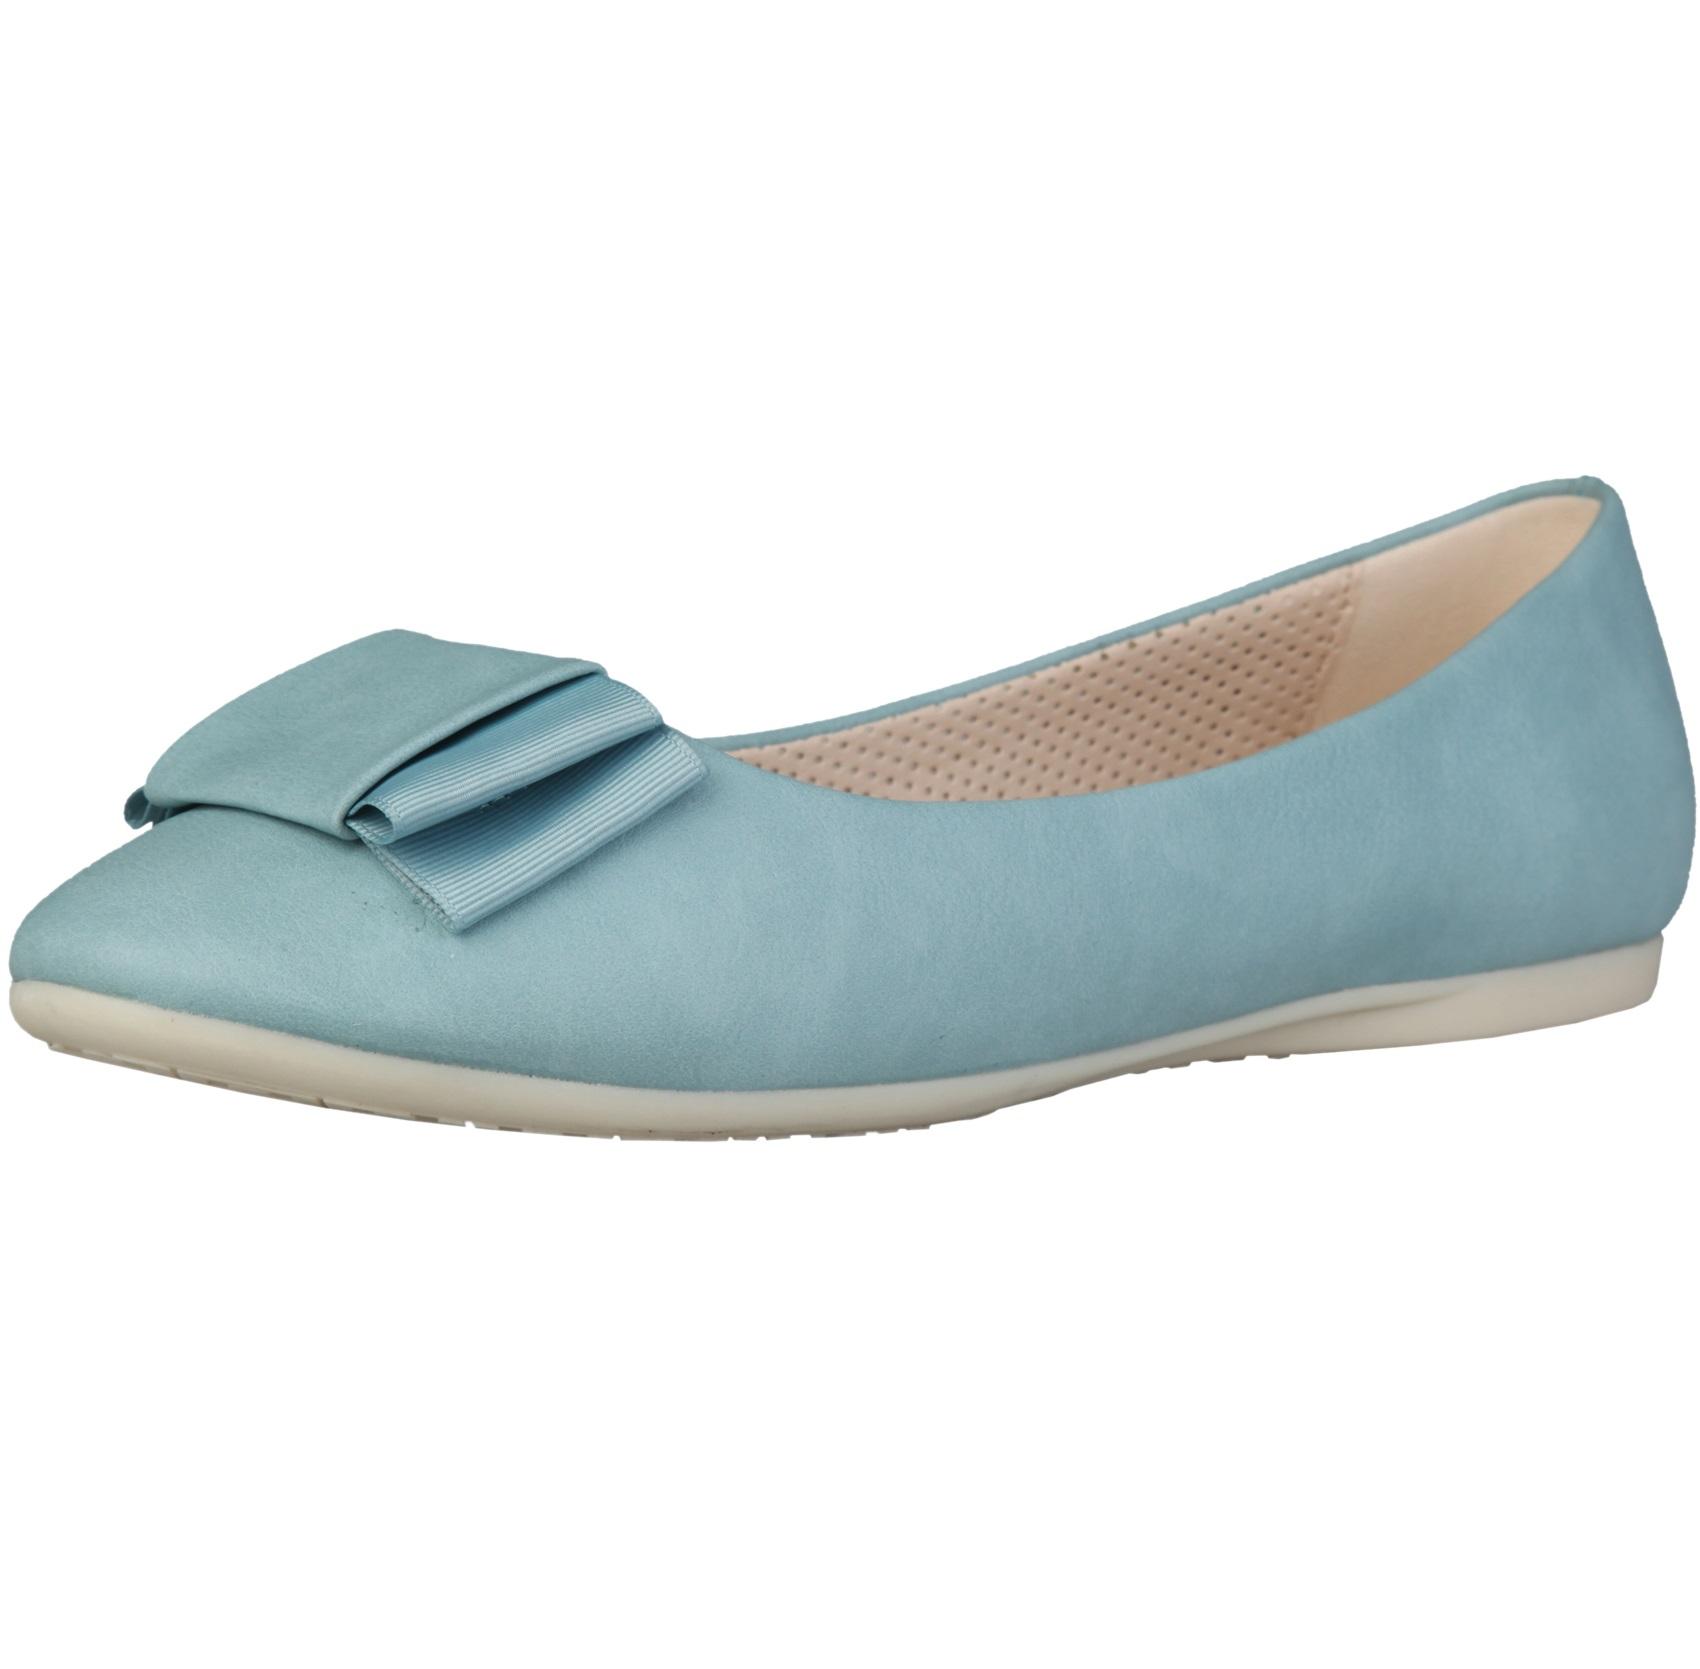 Sofia Loes Flat Shoes Fiocco Azzurro Rf600155